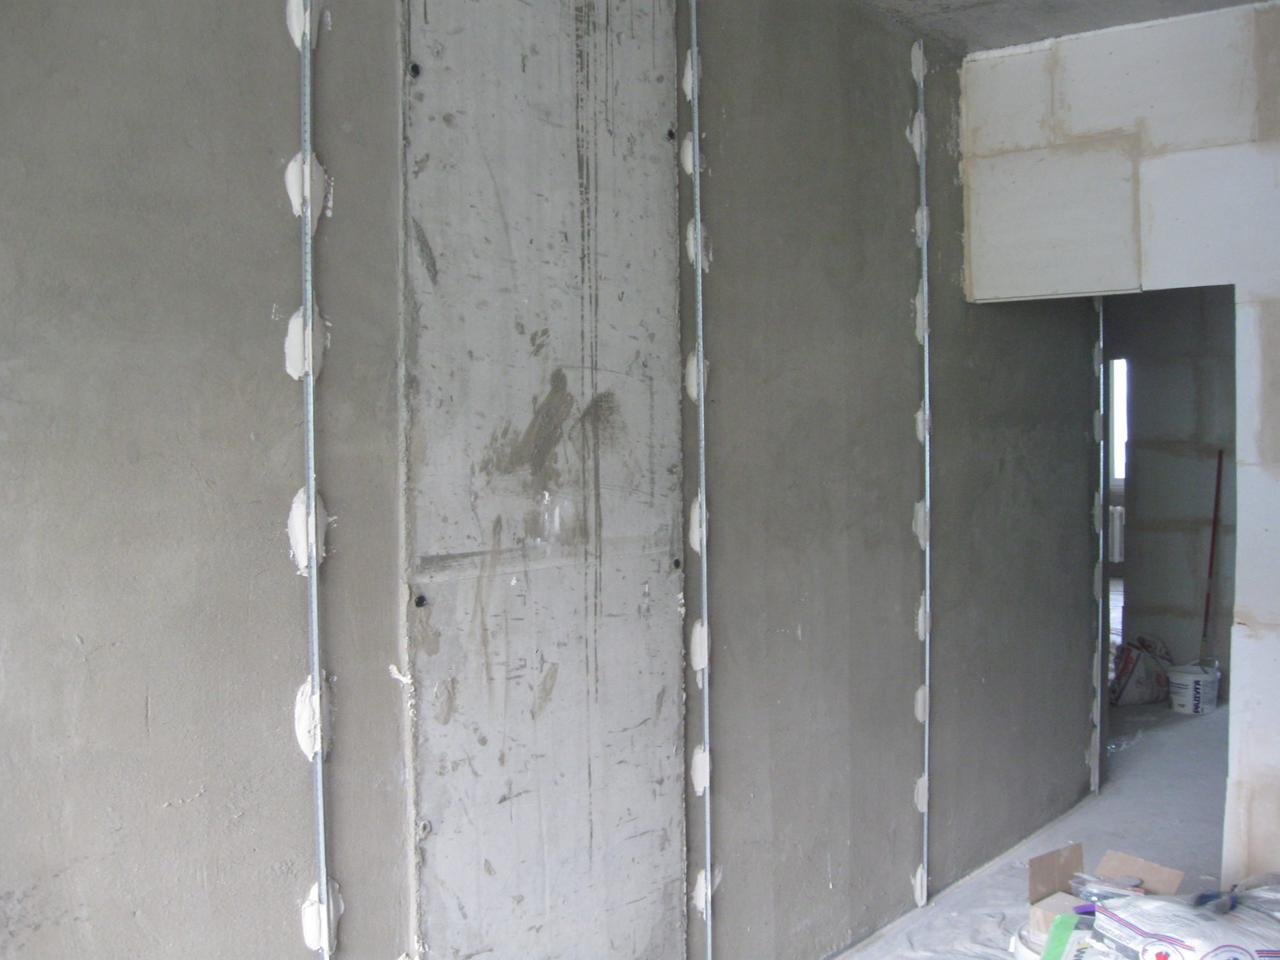 Оштукатуривание стен (выравнивание)  по маякам